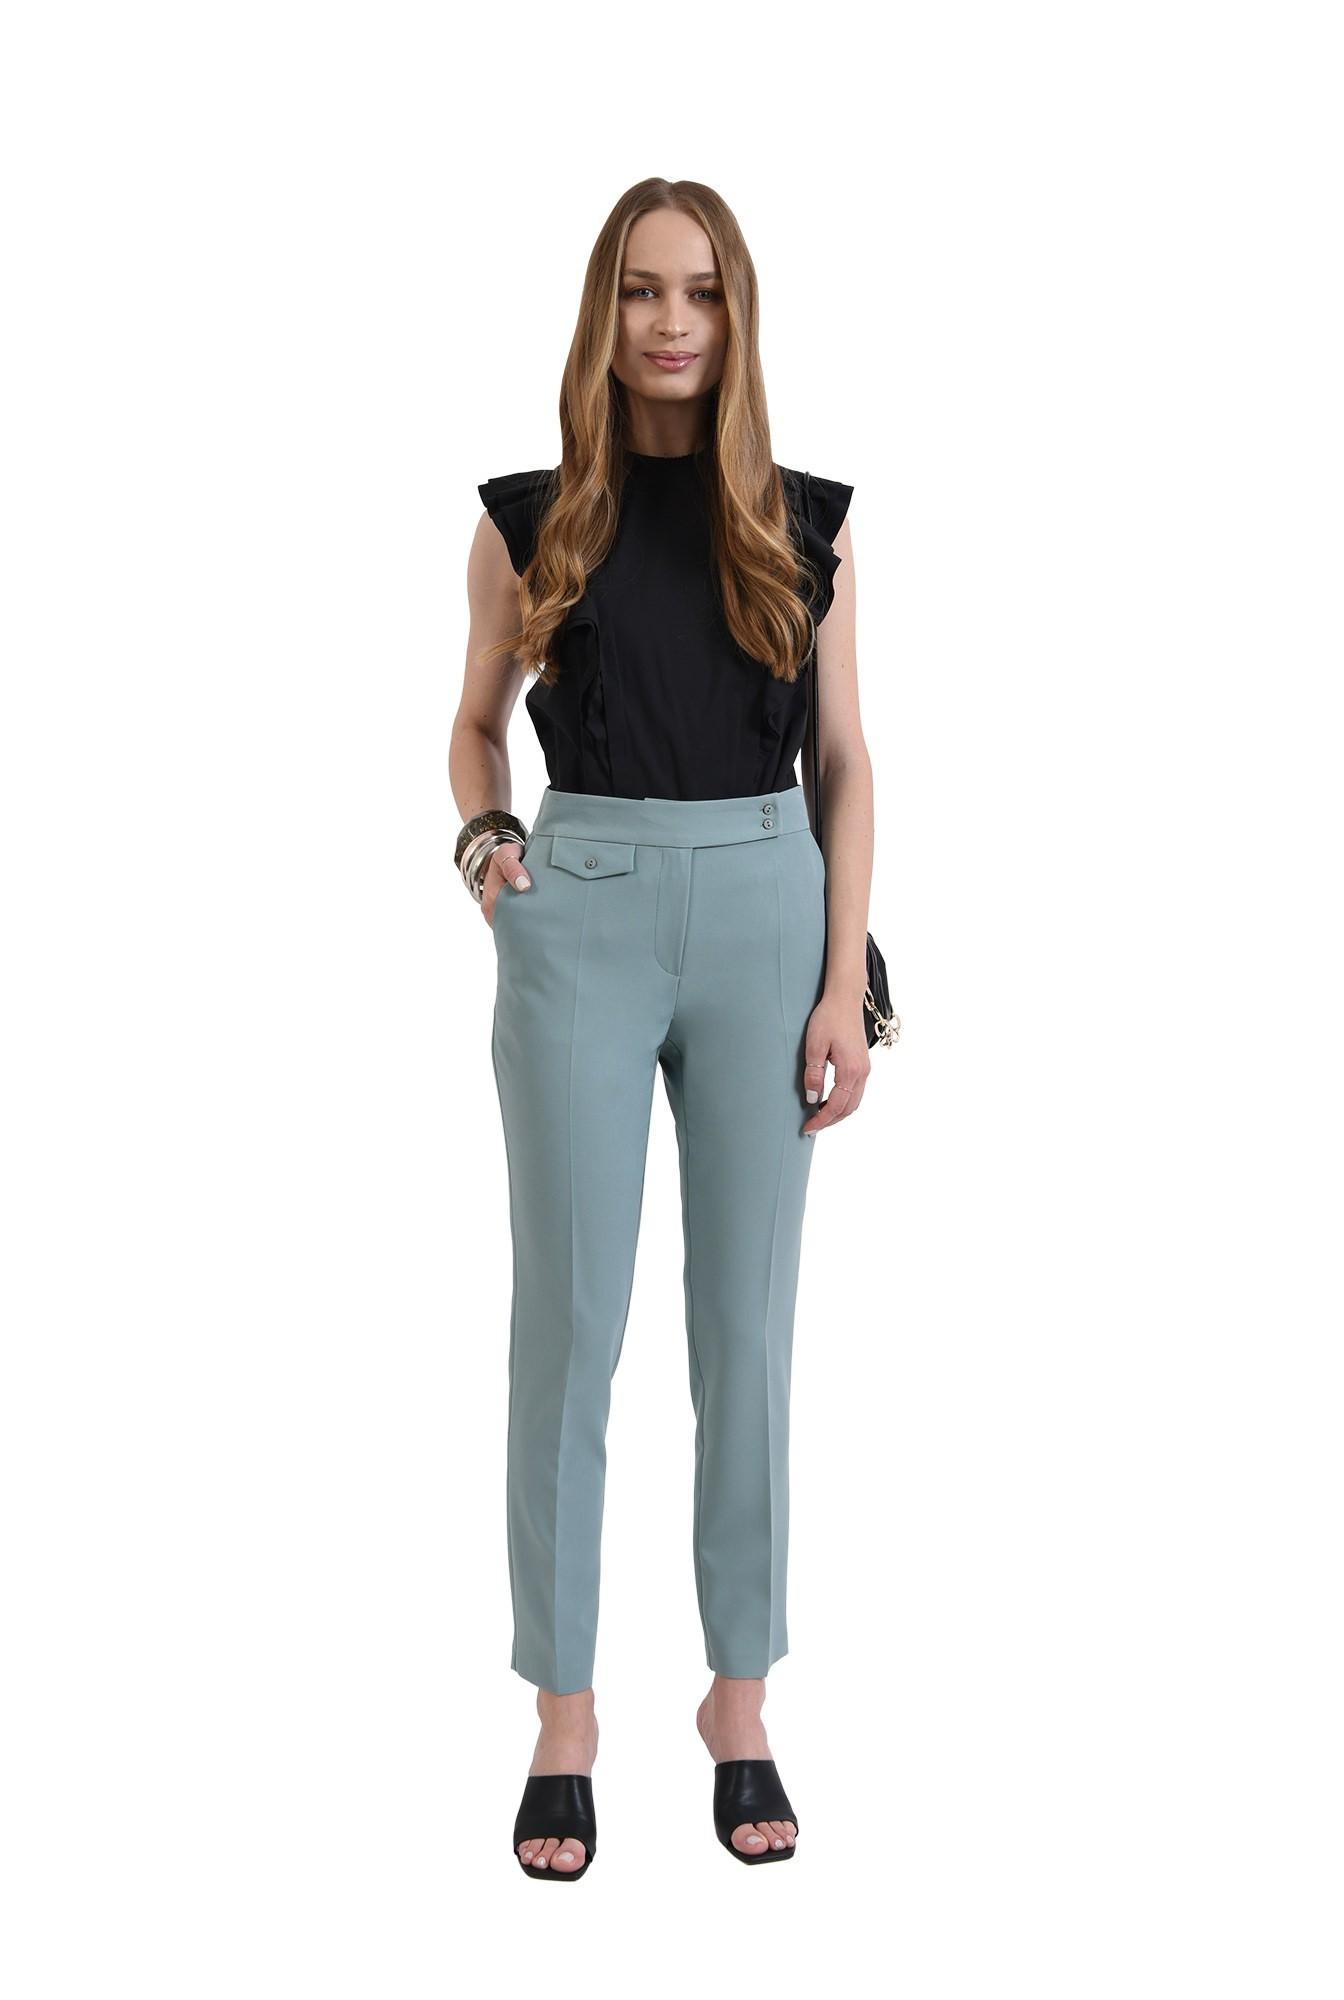 3 - pantaloni mint, casual, Poema